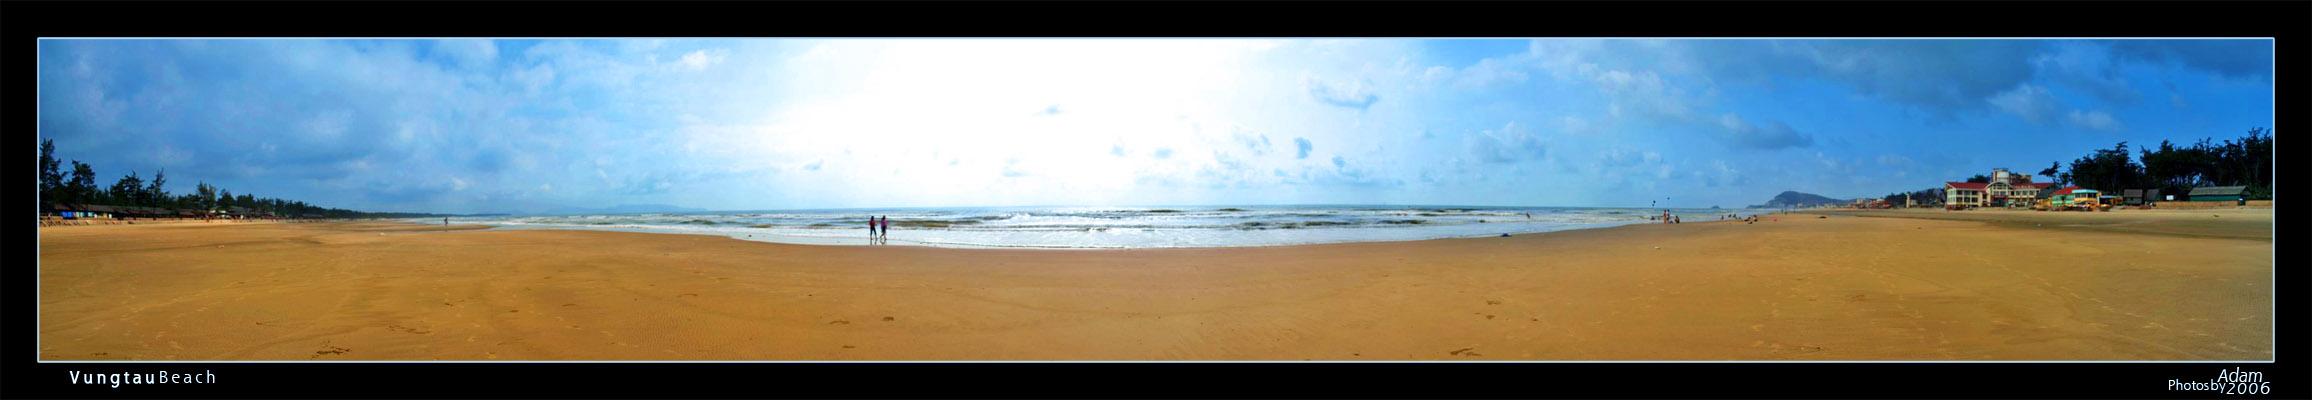 Panorama of VungTau Beach